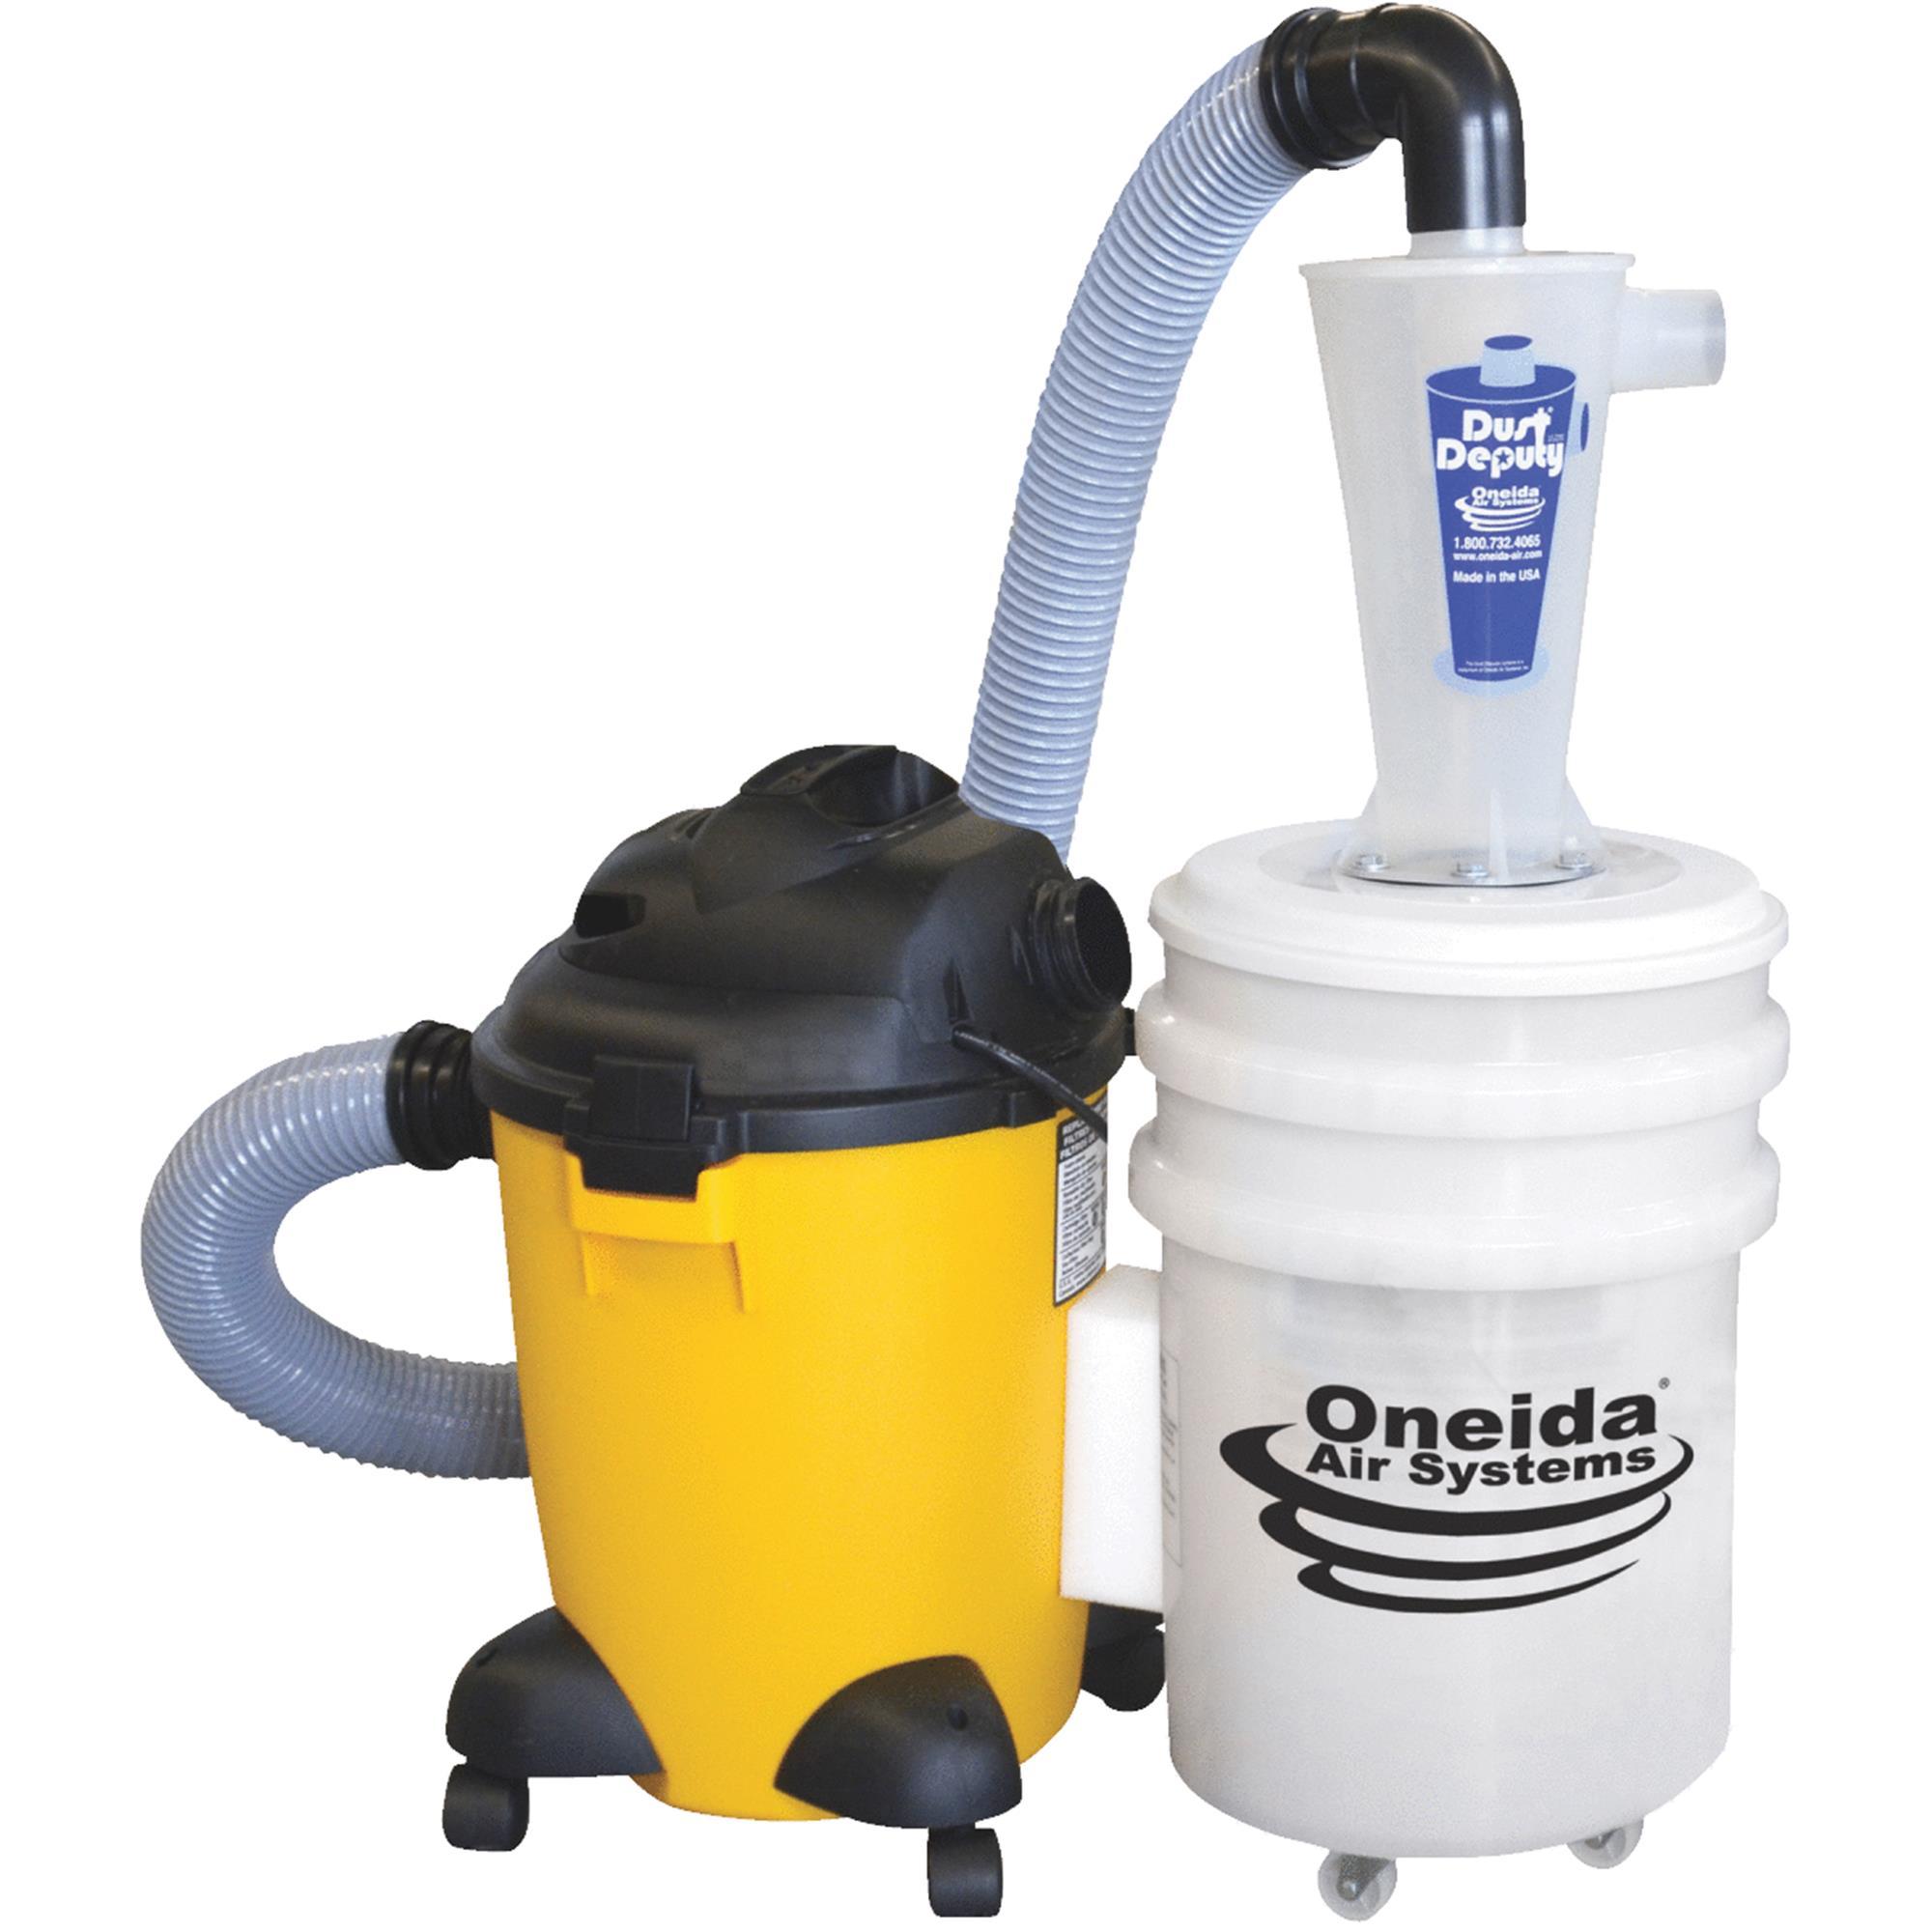 Oneida Dust Deputy Deluxe Cyclone Wet/Dry Vacuum Filter